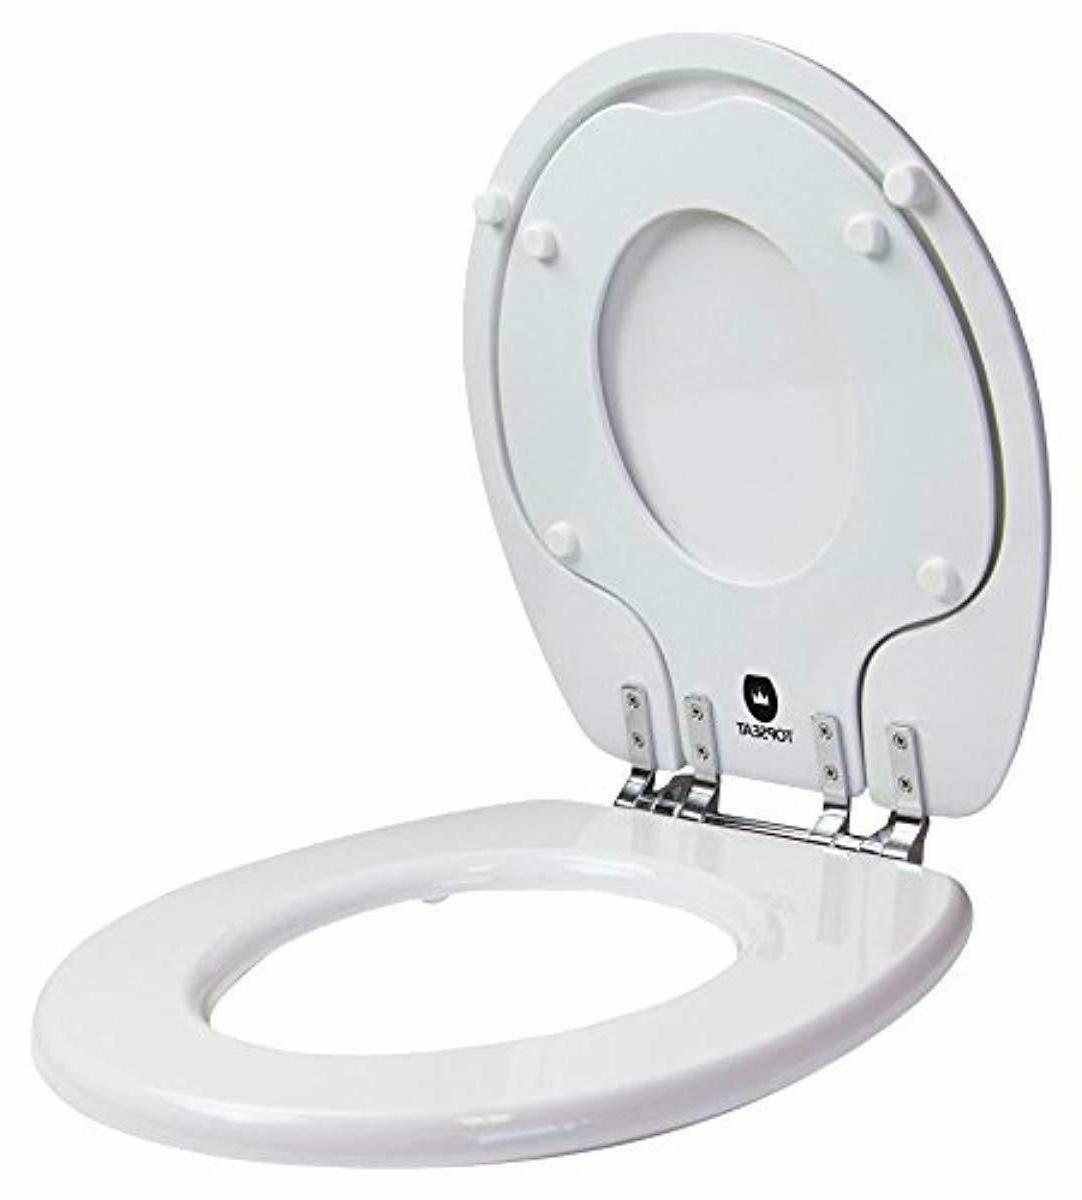 tinyhiney potty round toilet seat adult child